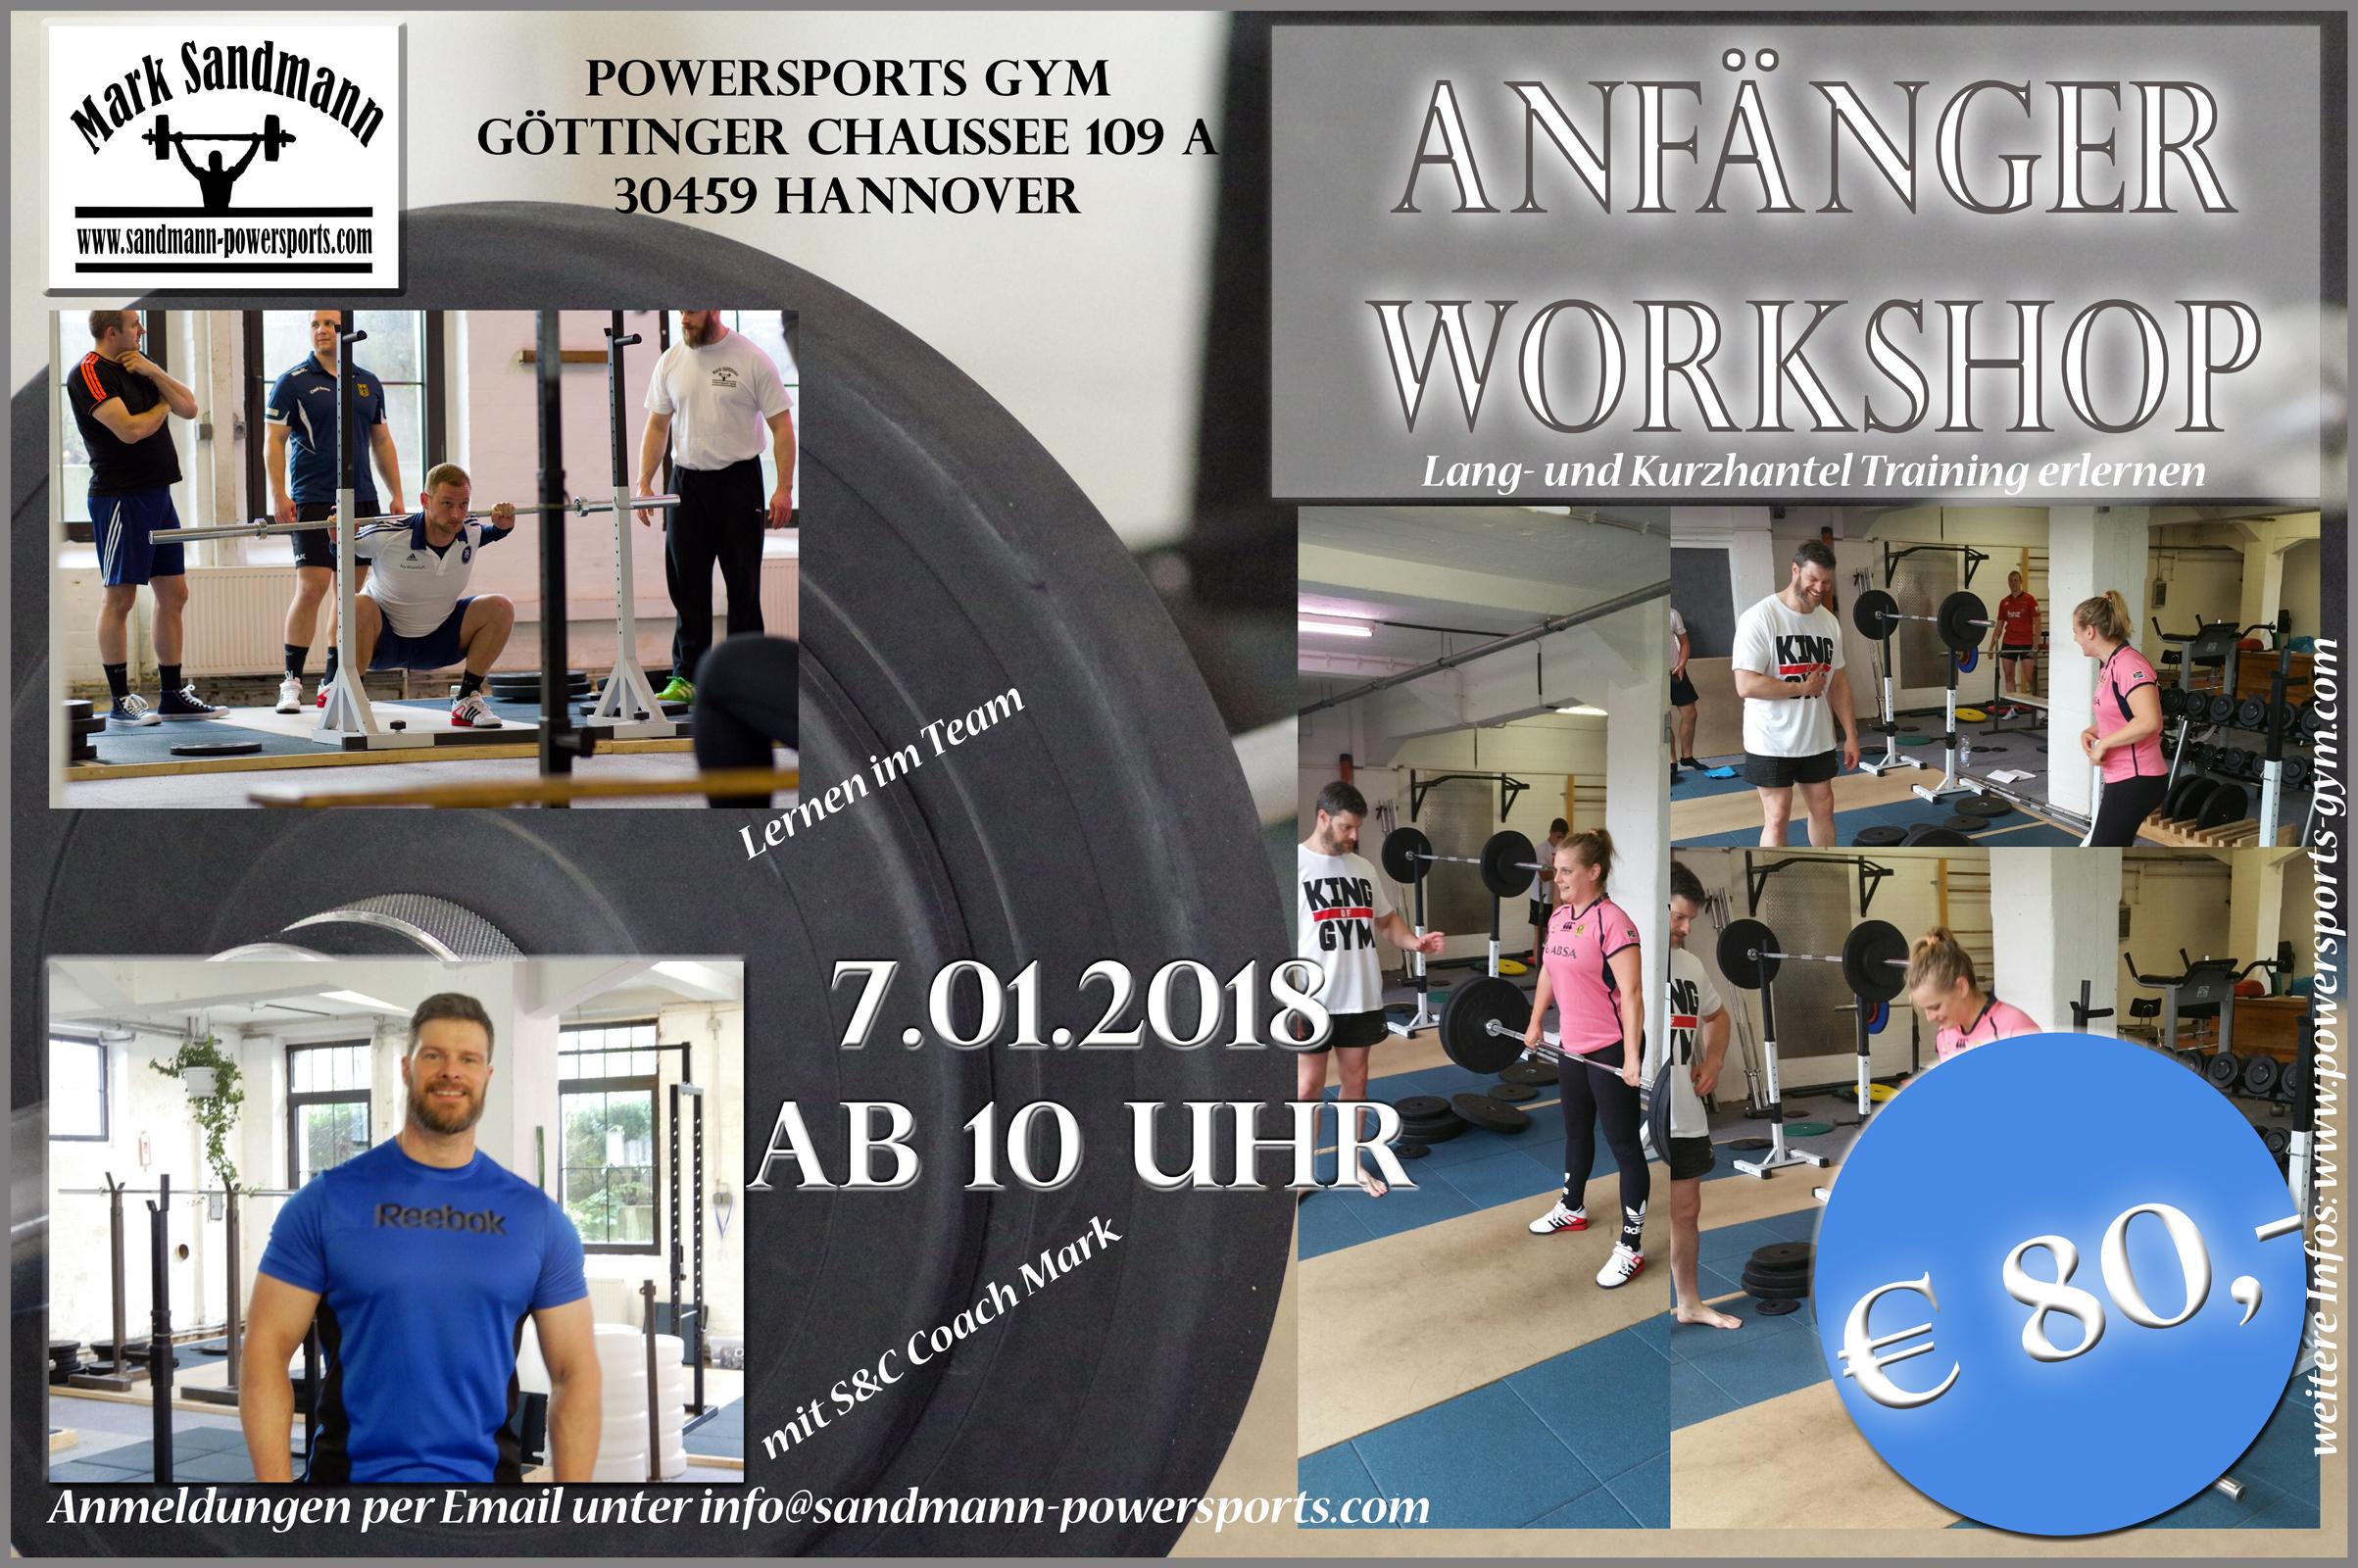 Workshop-Werbung-November-2017